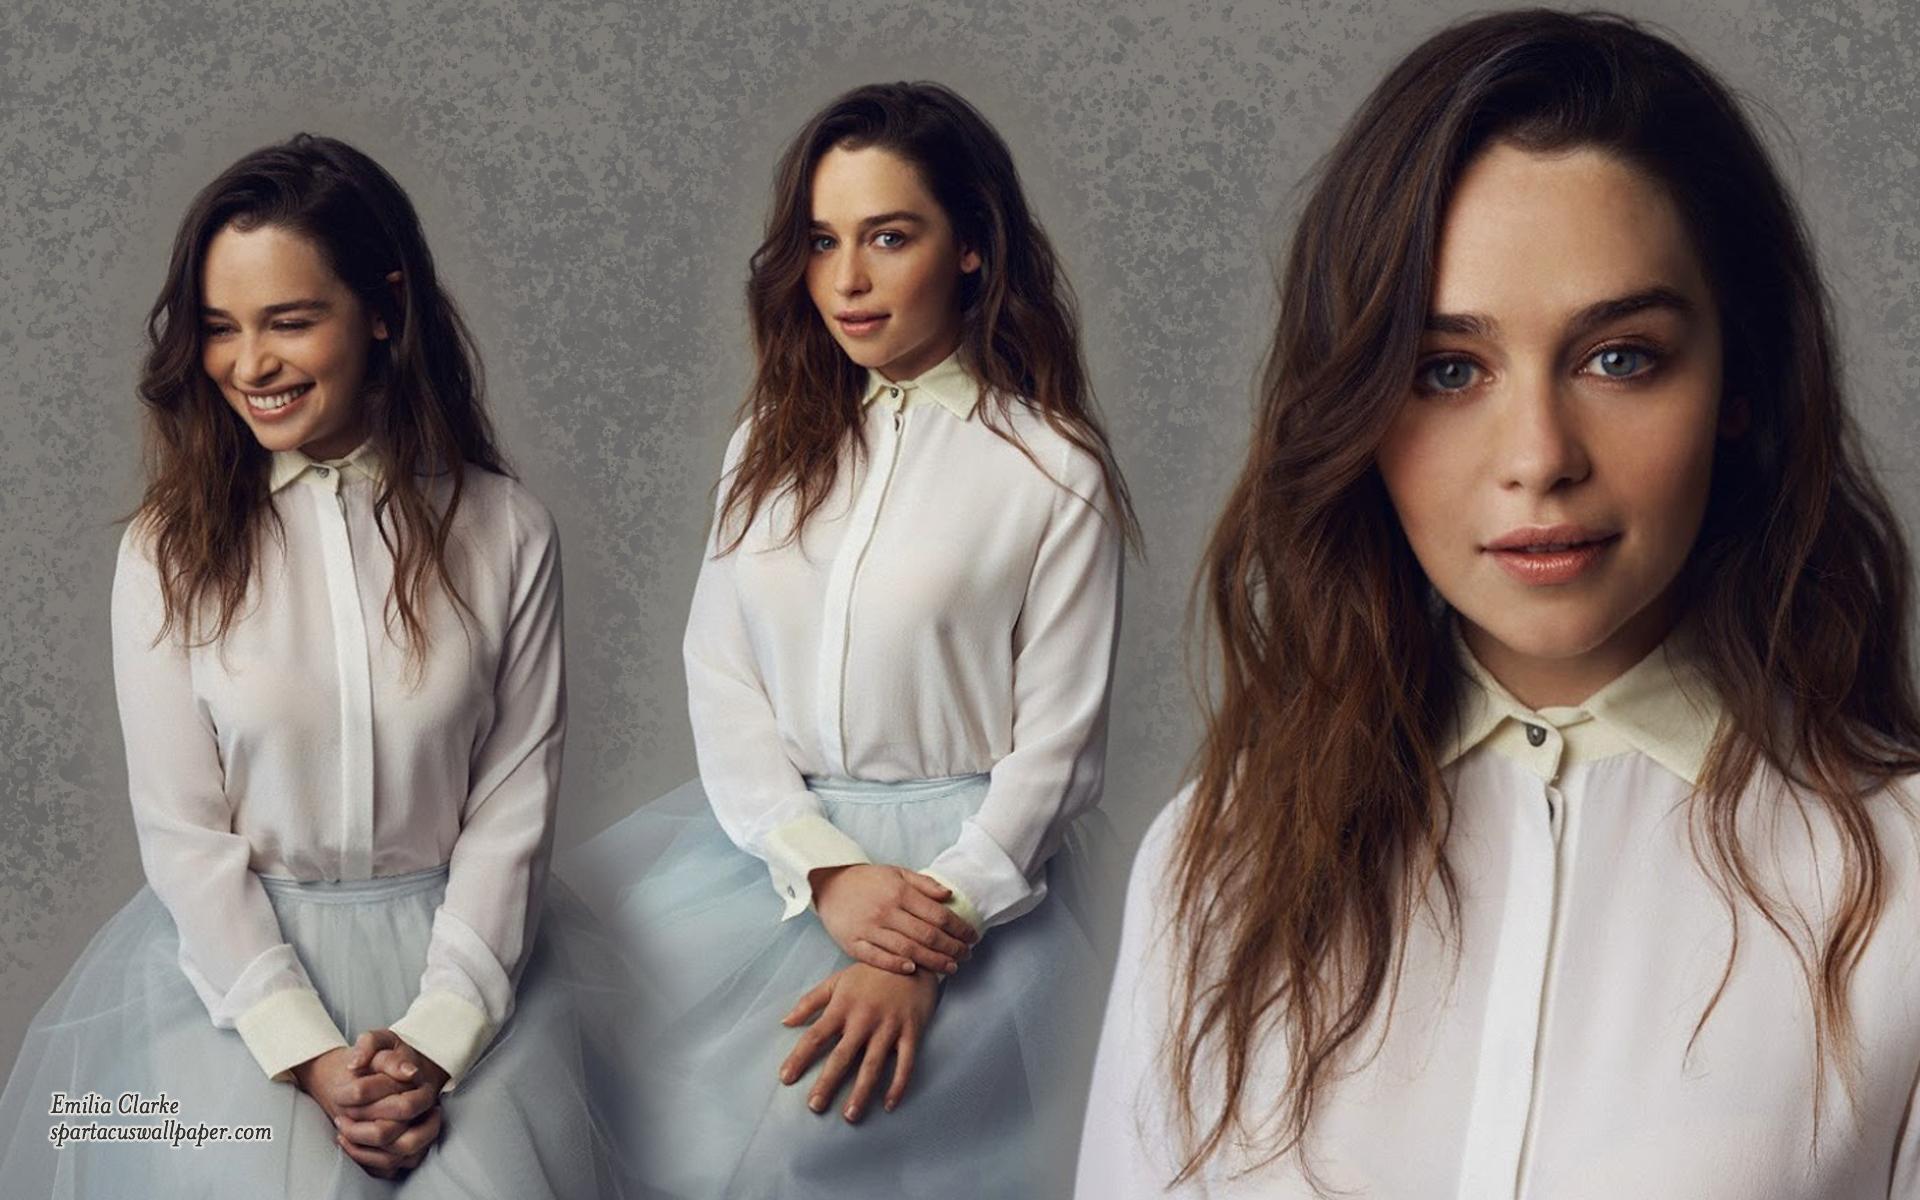 XXX Emilia Clarke nudes (69 photos), Topless, Fappening, Twitter, cameltoe 2019